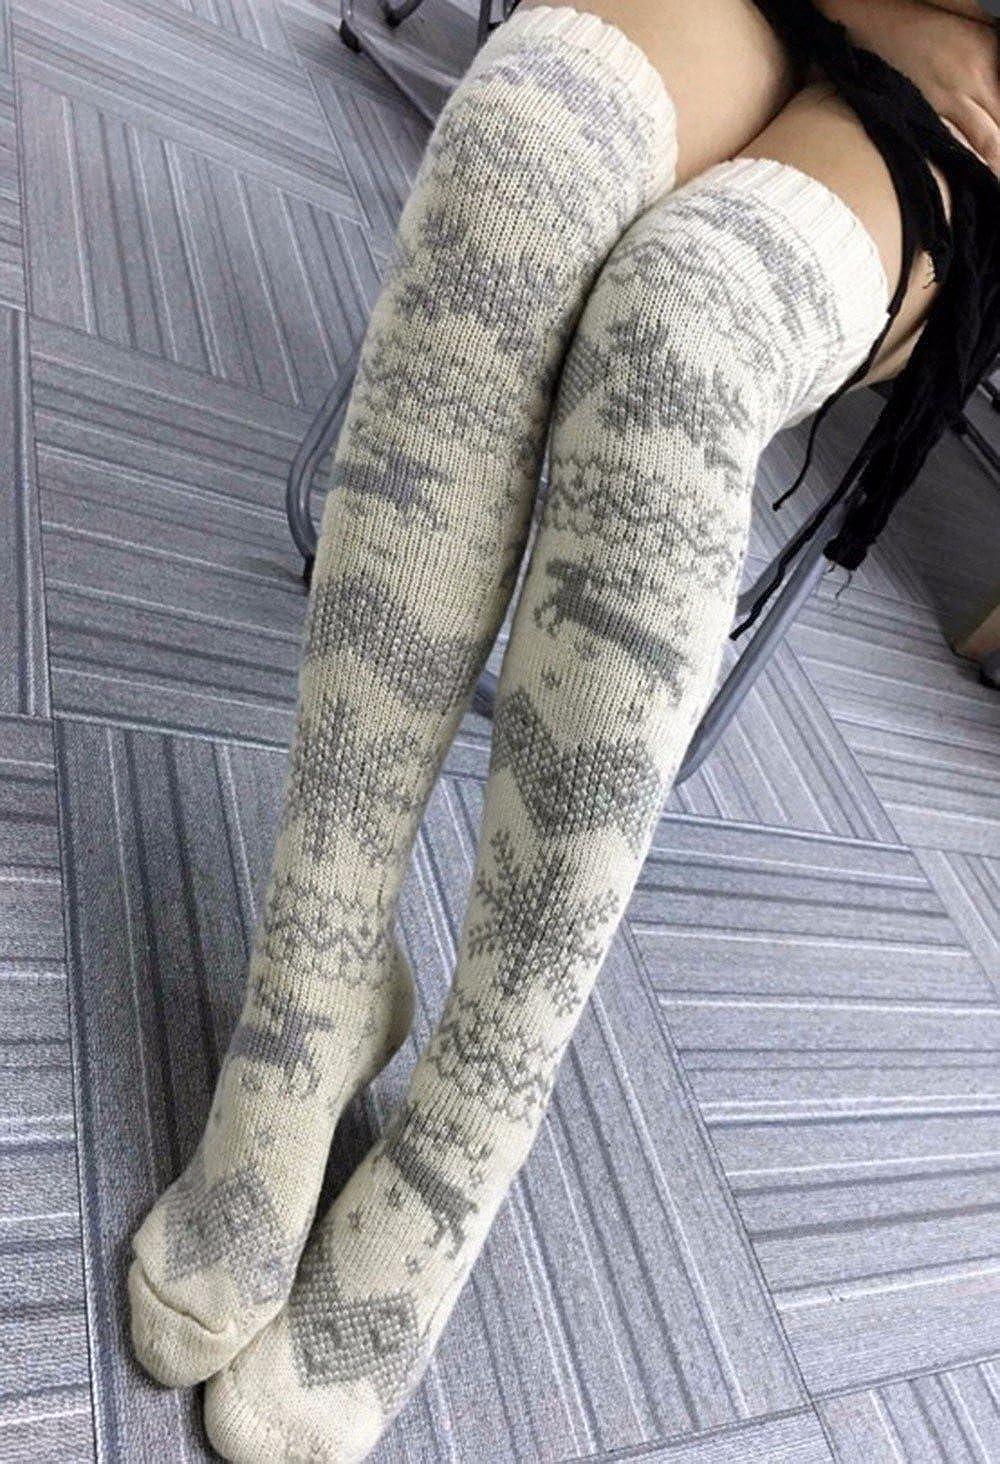 0b3b8e3fa Amazon.com  STORTO Women Christmas Knit Long Socks Casual Reindeer Over  Knee Warm Socks  Clothing